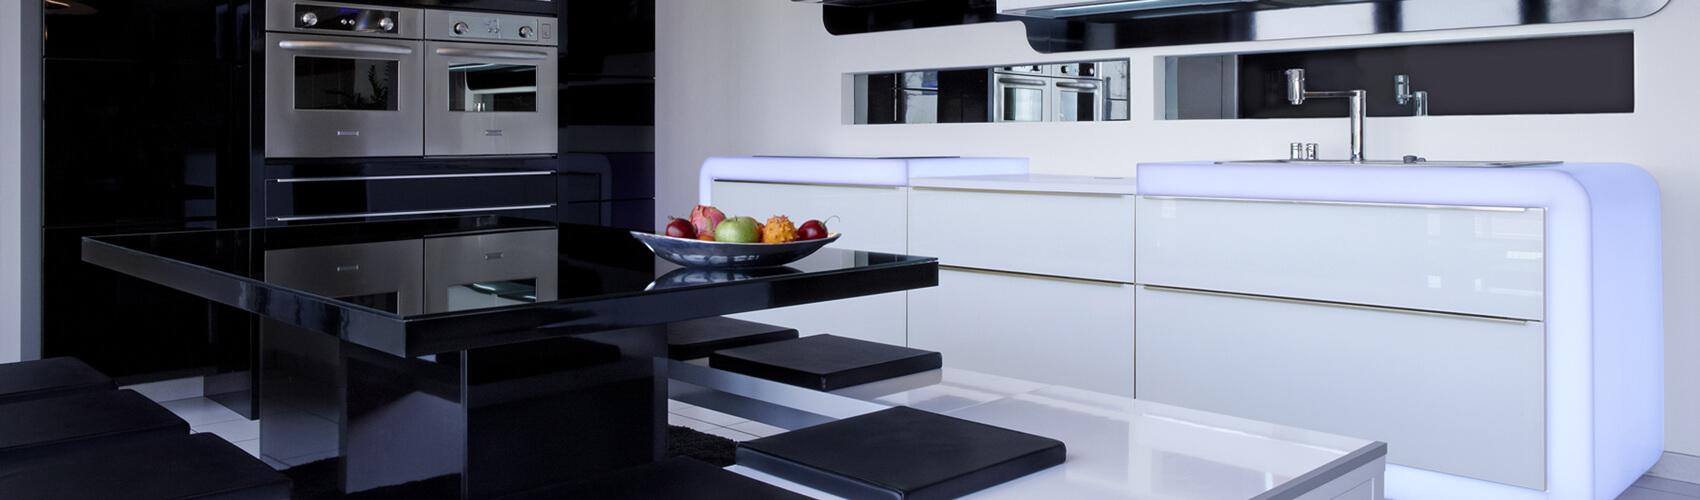 LG HiMacs – het unieke solid surface materiaal  Correnti # Wasbak Hi Macs_145319